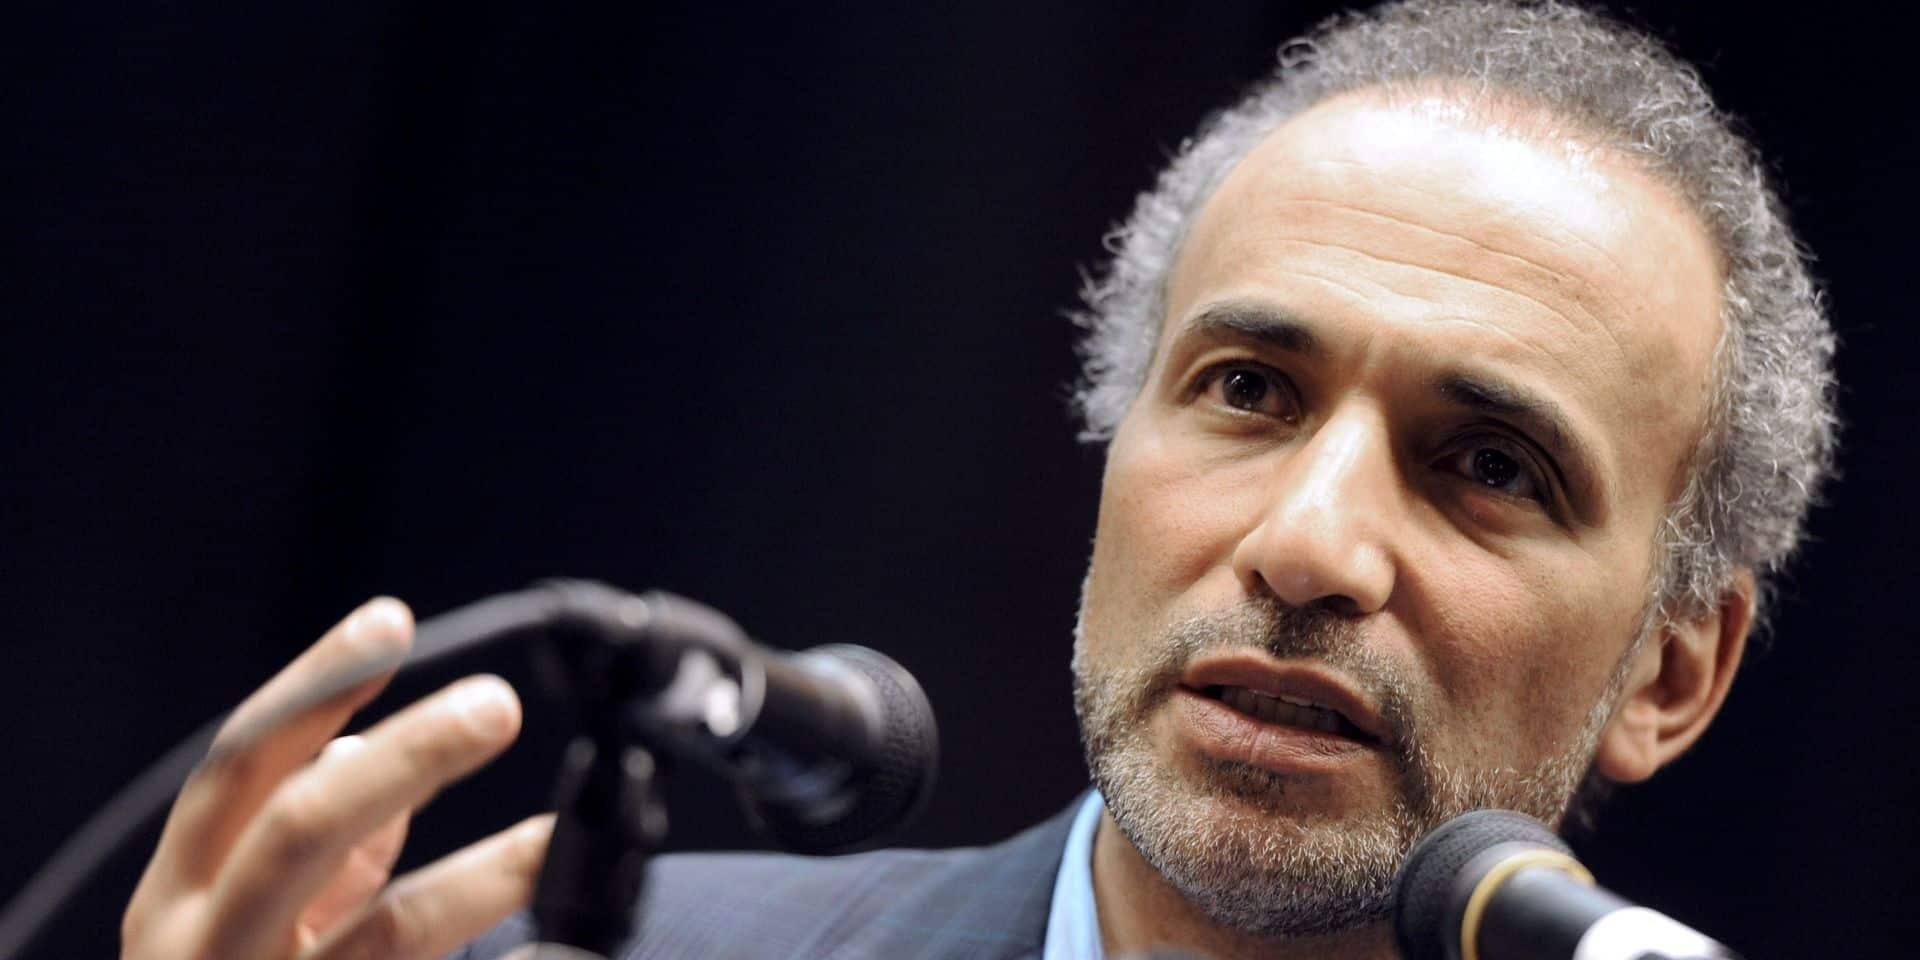 Une accusatrice de Tariq Ramadan veut faire interdire la sortie de son livre